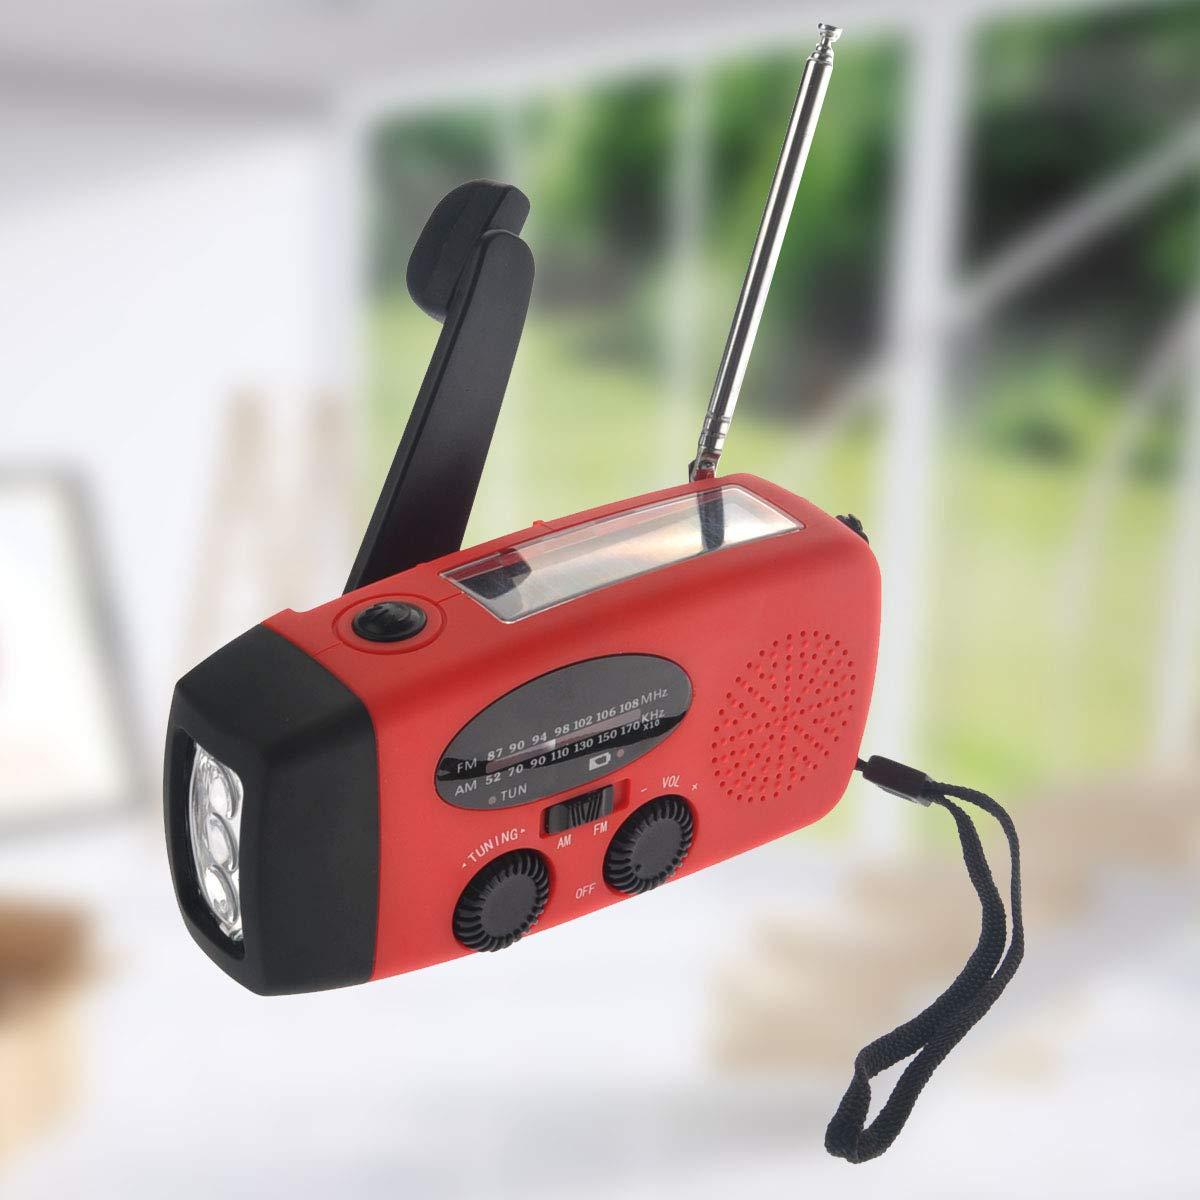 VOSAREA Emergency Solar Crank AM FM Camp Radio with LED Flashlight USB Output Port(Red) by VOSAREA (Image #8)